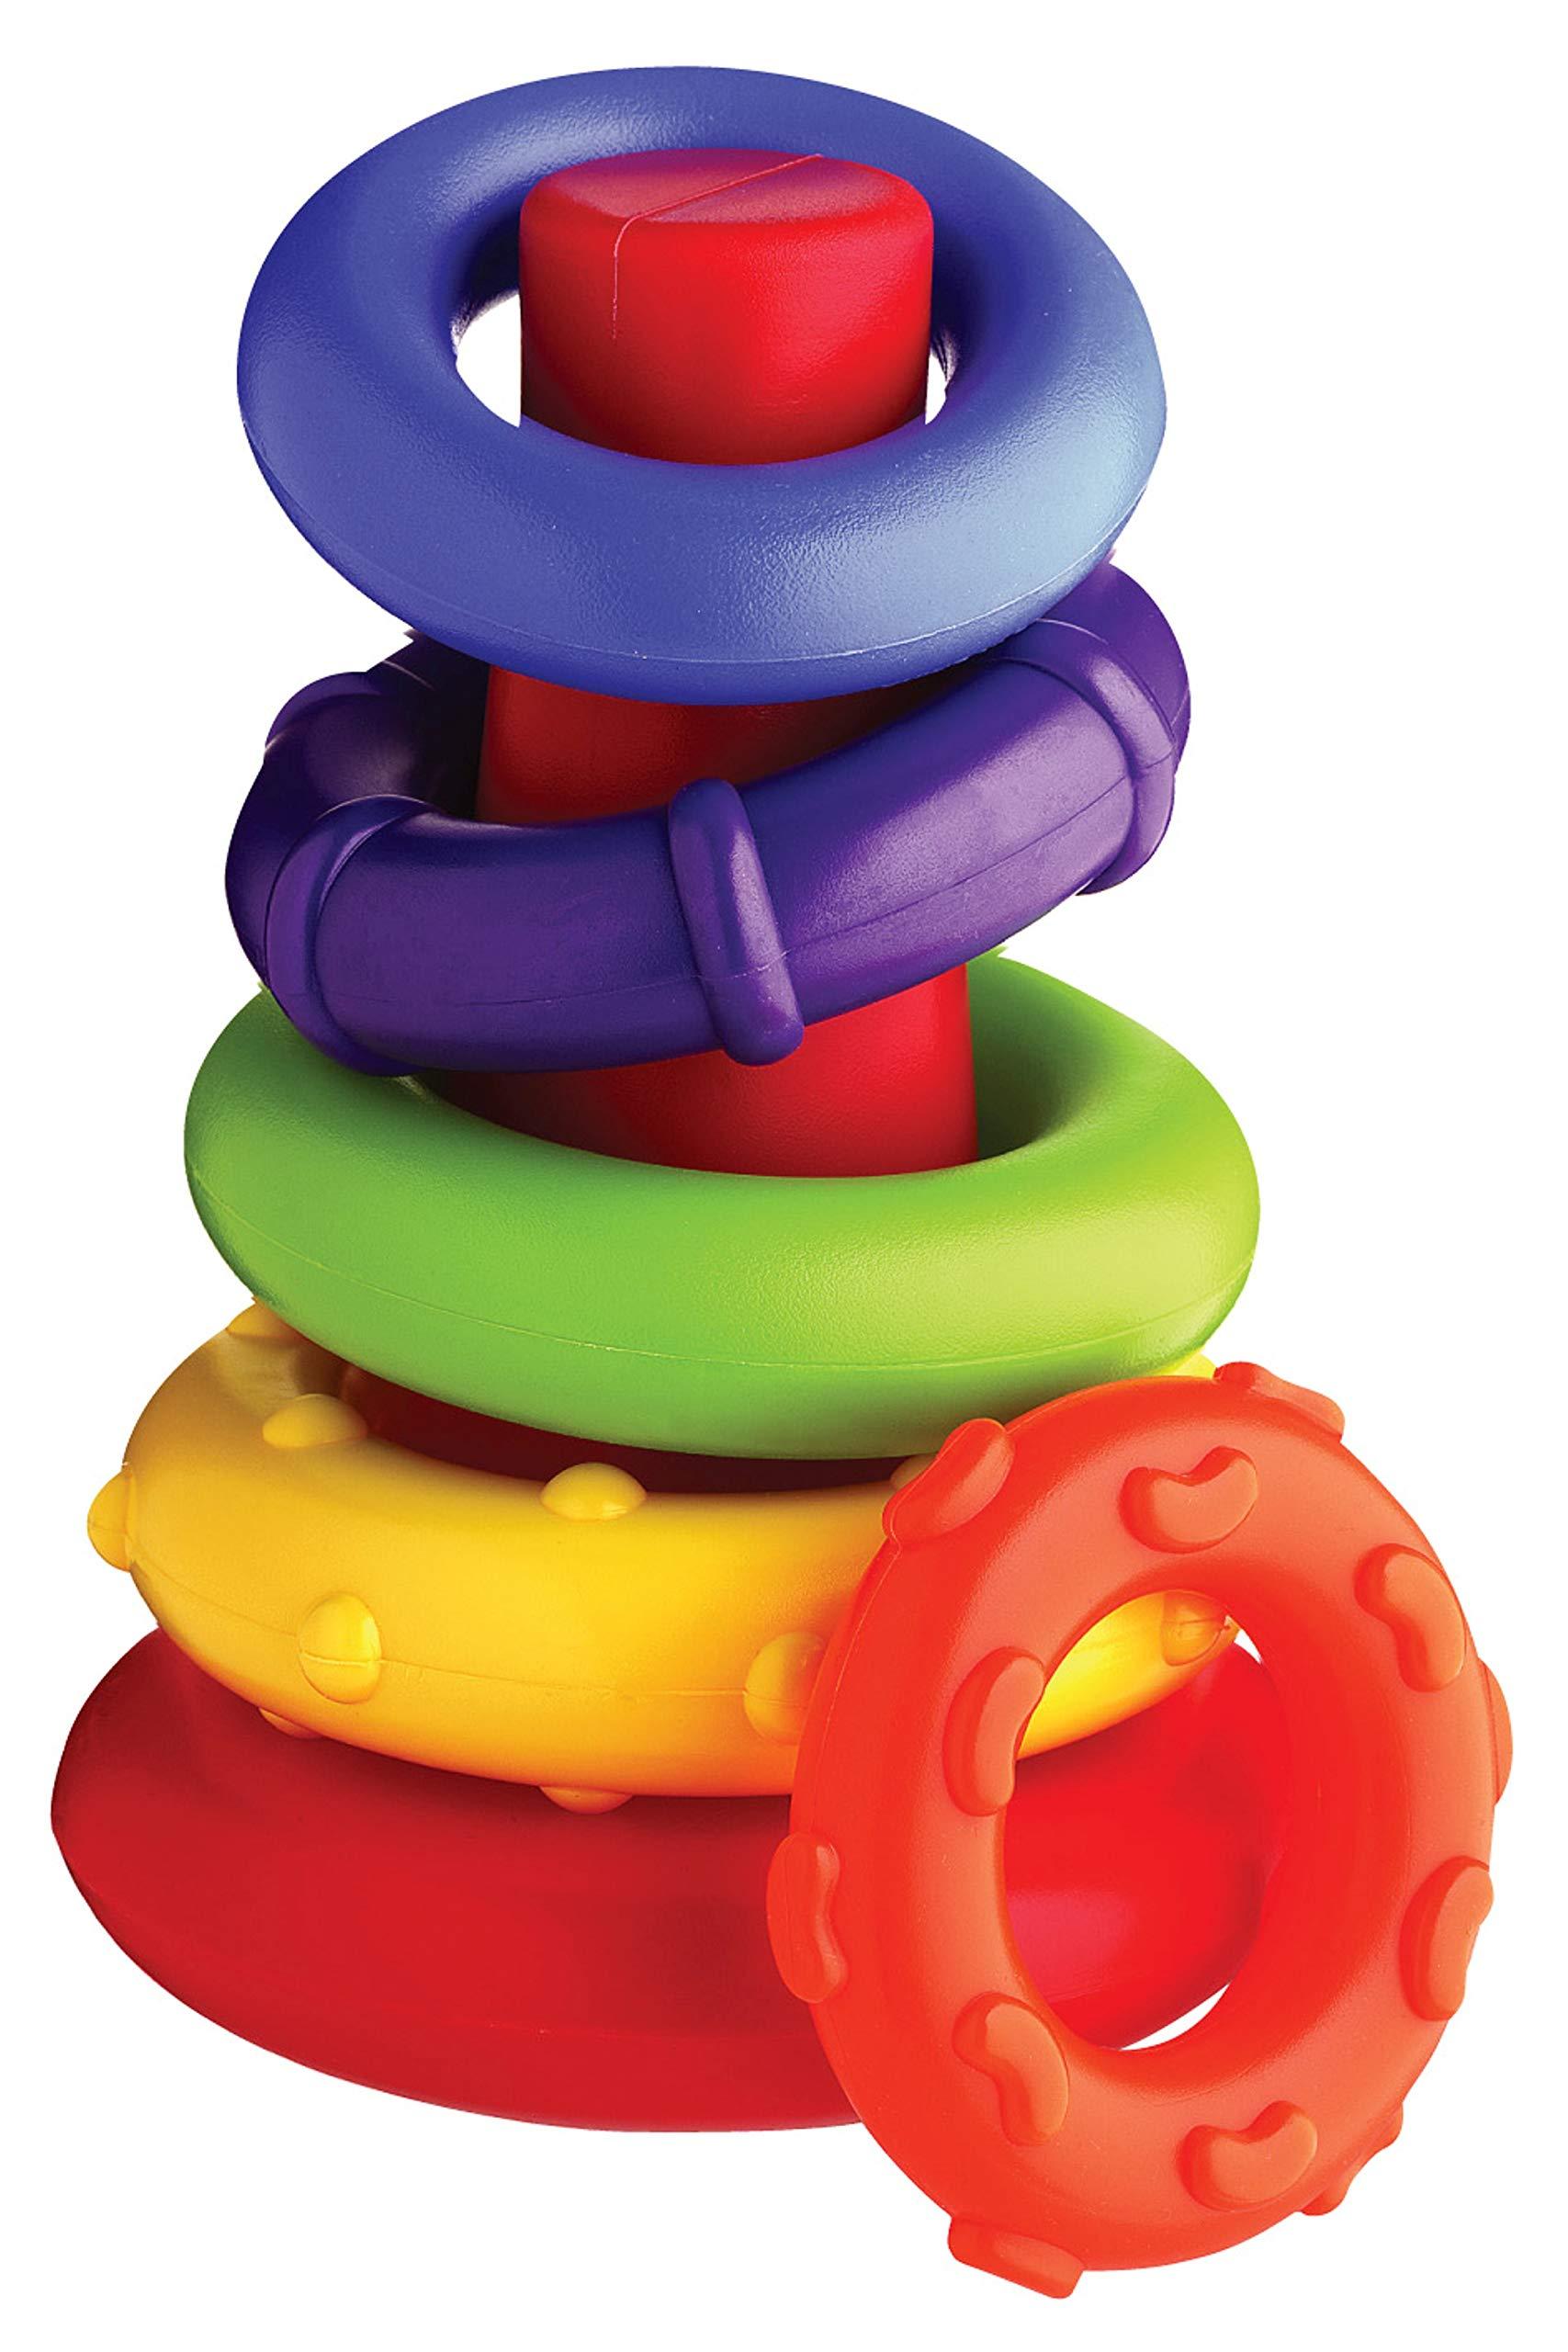 Playgro-40082 Pirámide Rock and Stack, Color Verde, Amarillo, Rojo, Lila, Naranja (4011455)